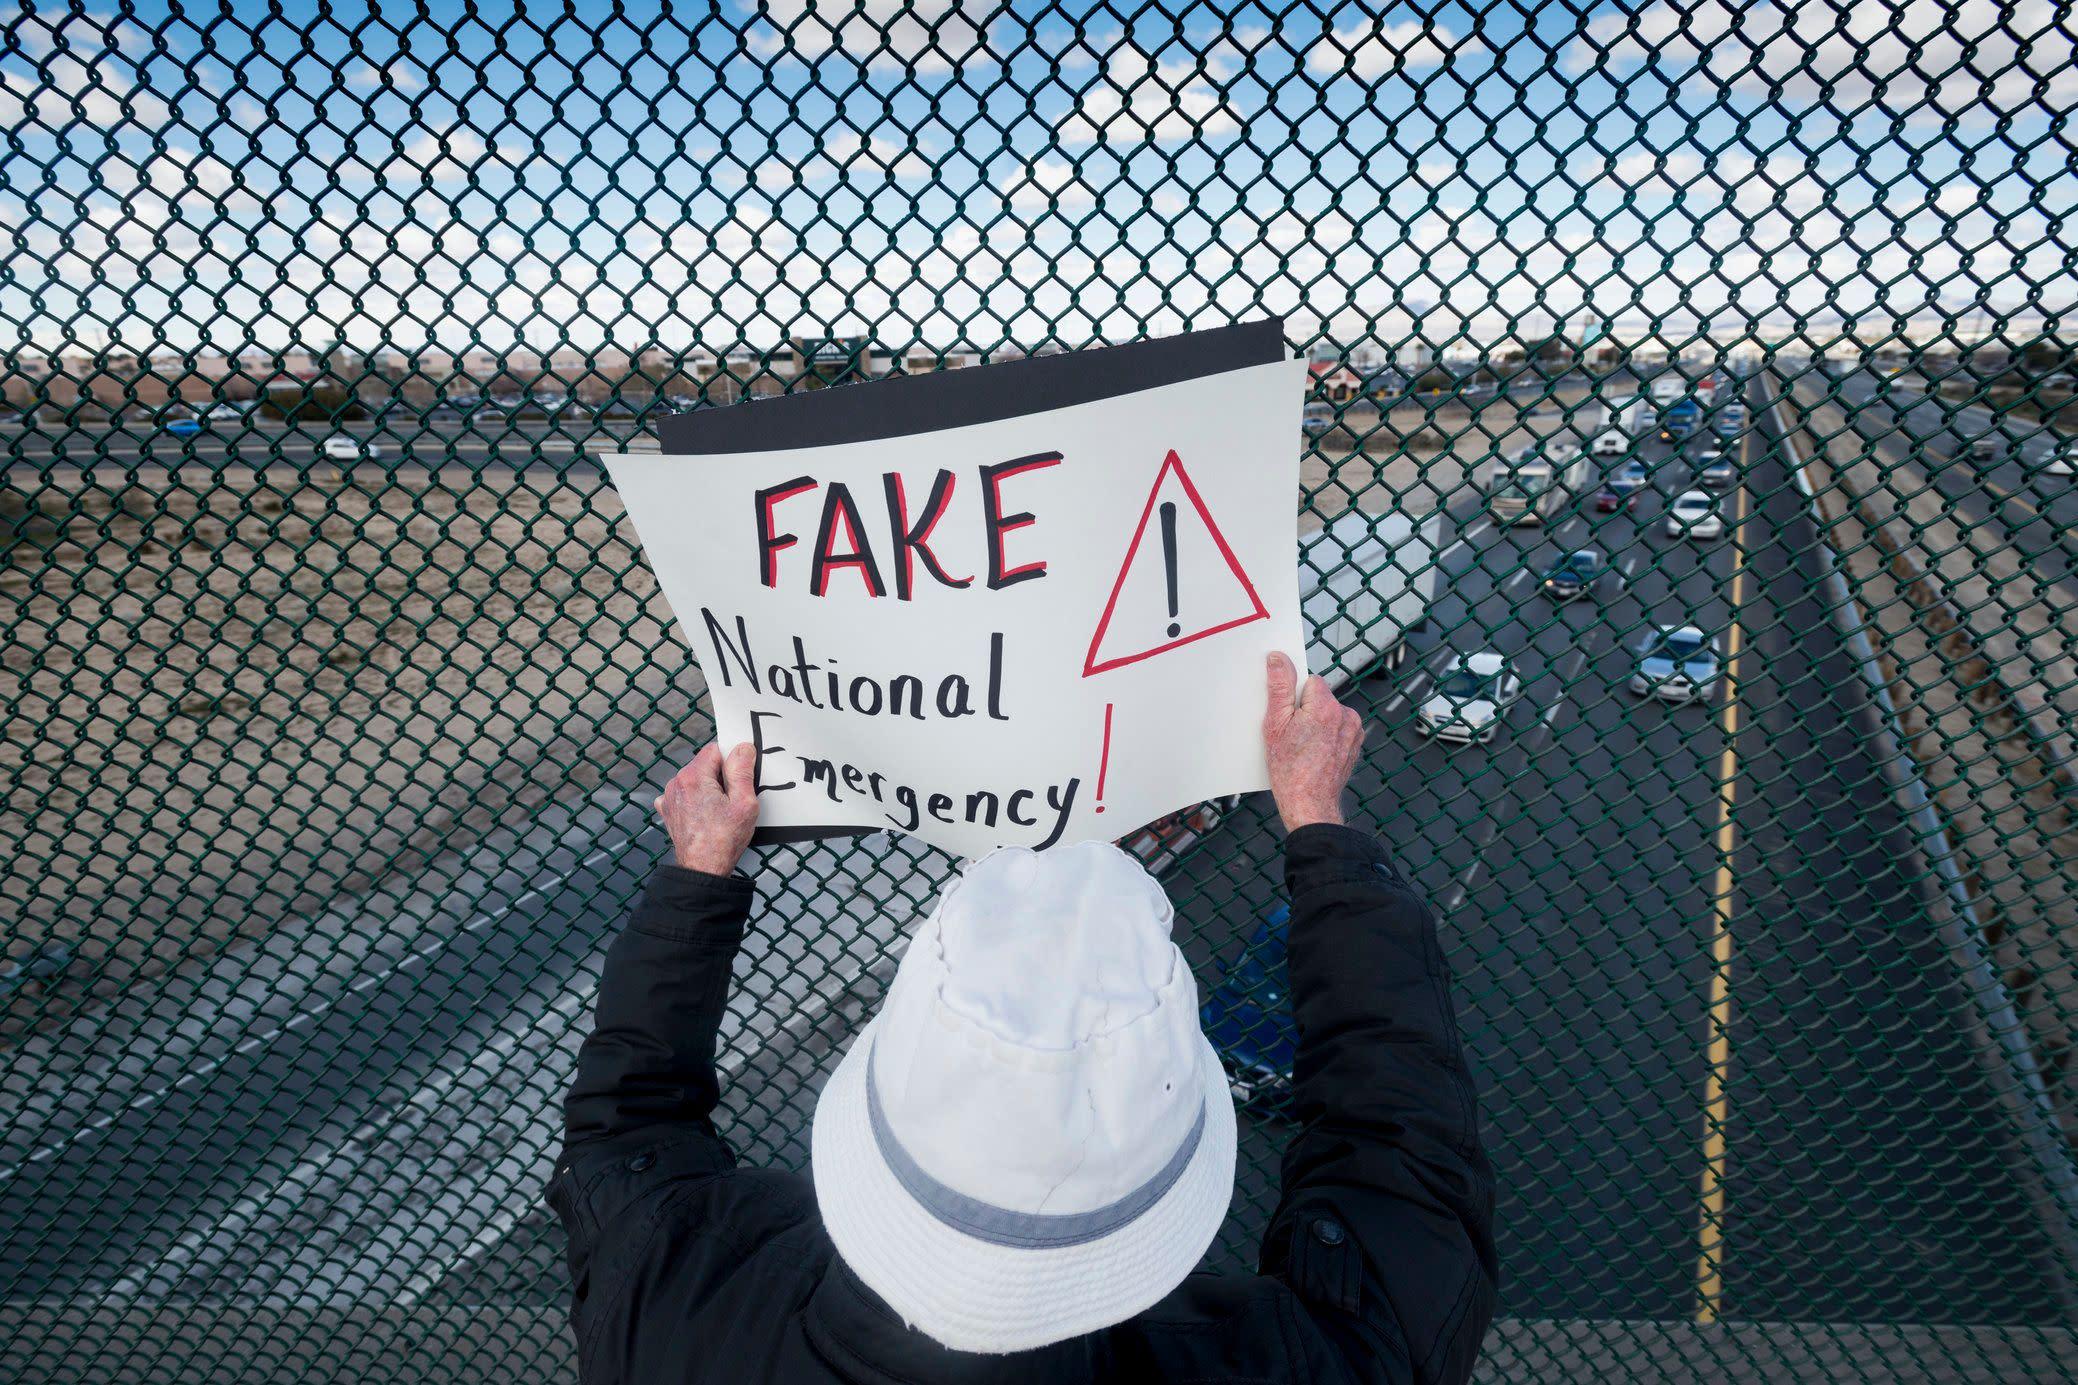 Morning Brief: 16 states sue Trump over emergency wall declaration